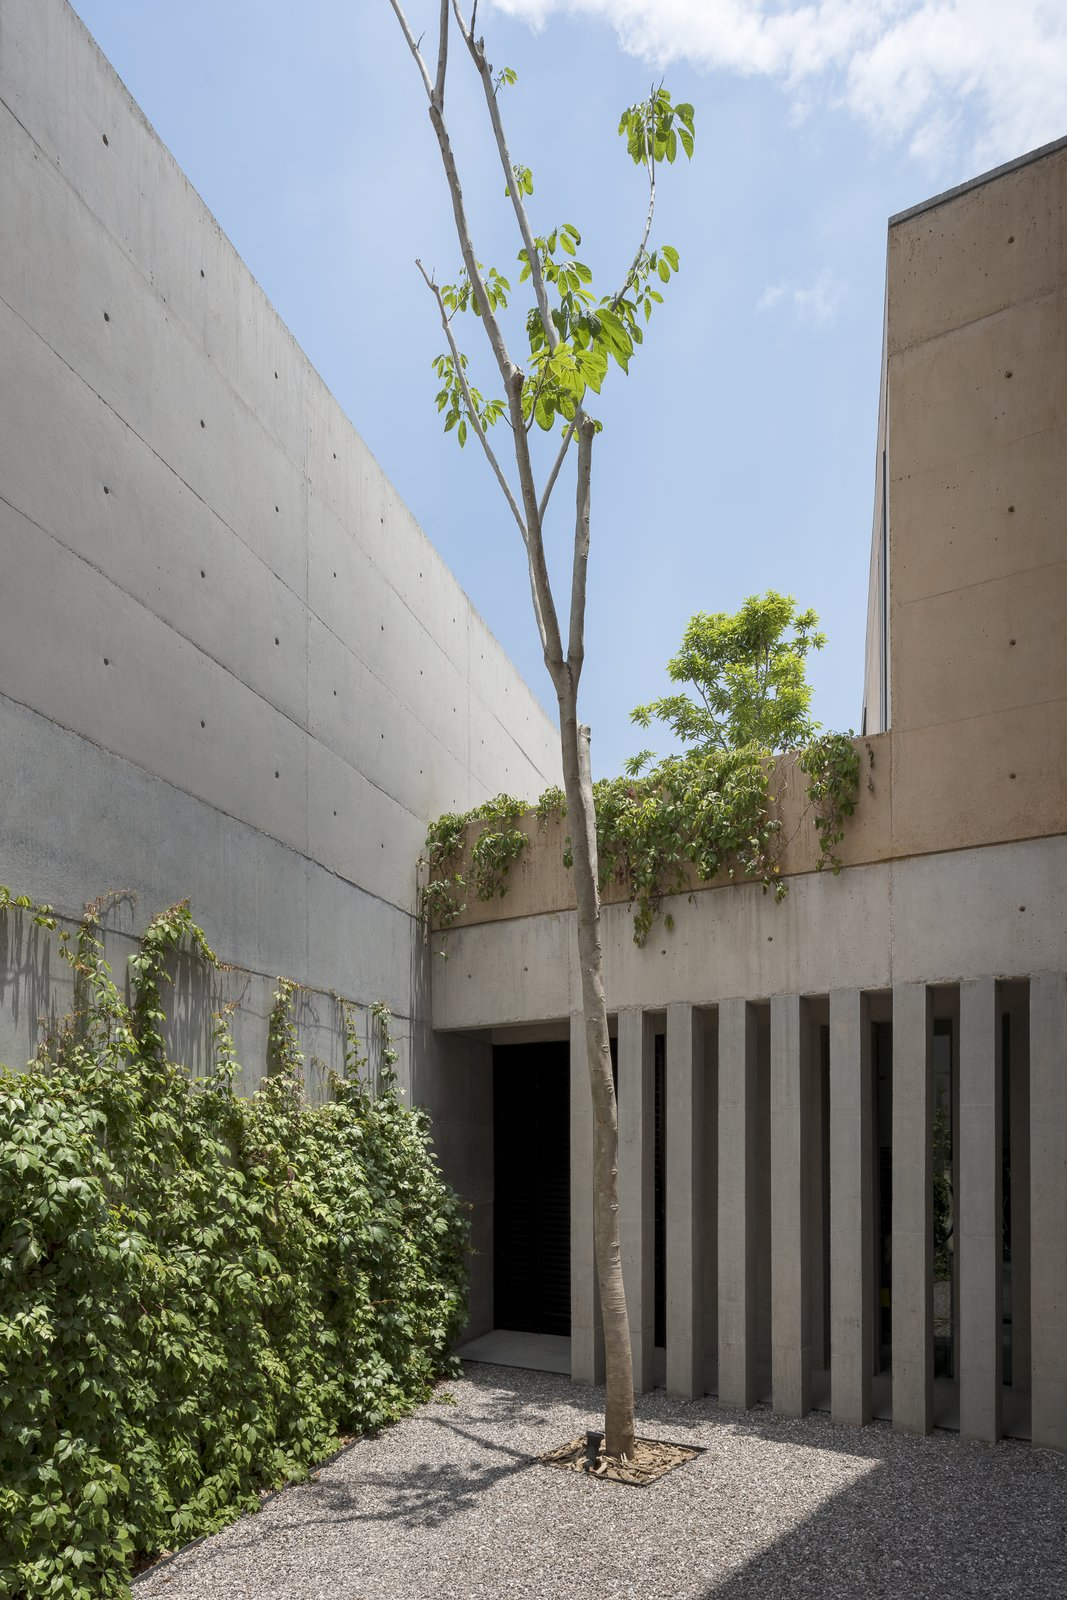 Outdoor, Trees, Concrete Patio, Porch, Deck, and Garden contrast between grey concrete and earthy-colored concrete.  Casa Moulat by CCA | Centro de Colaboración Arquitectónica